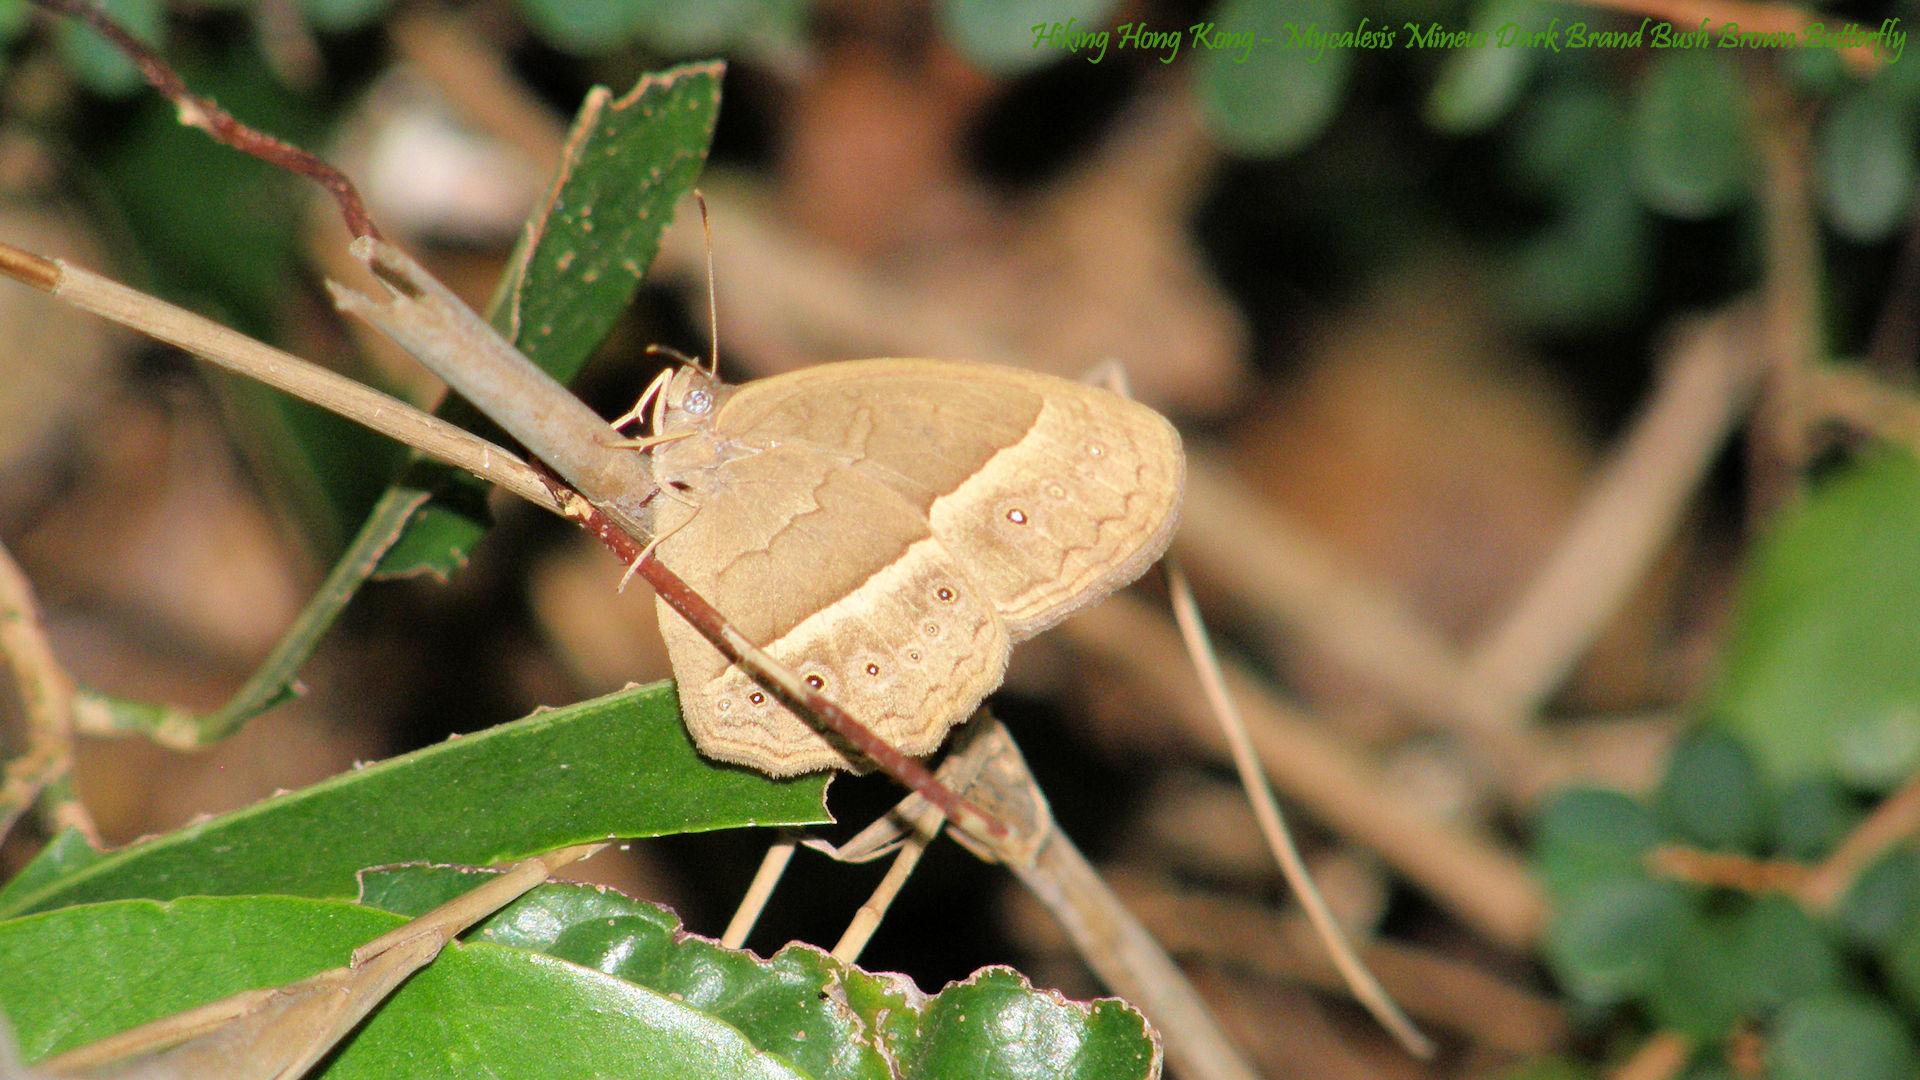 Hong-Kong-Butterfly-Mycalesis-Mineus-Dark-Brand-Bush-Brown-Butterfly-Hiking-Hong-Kong-wallpaper-wpc5805980